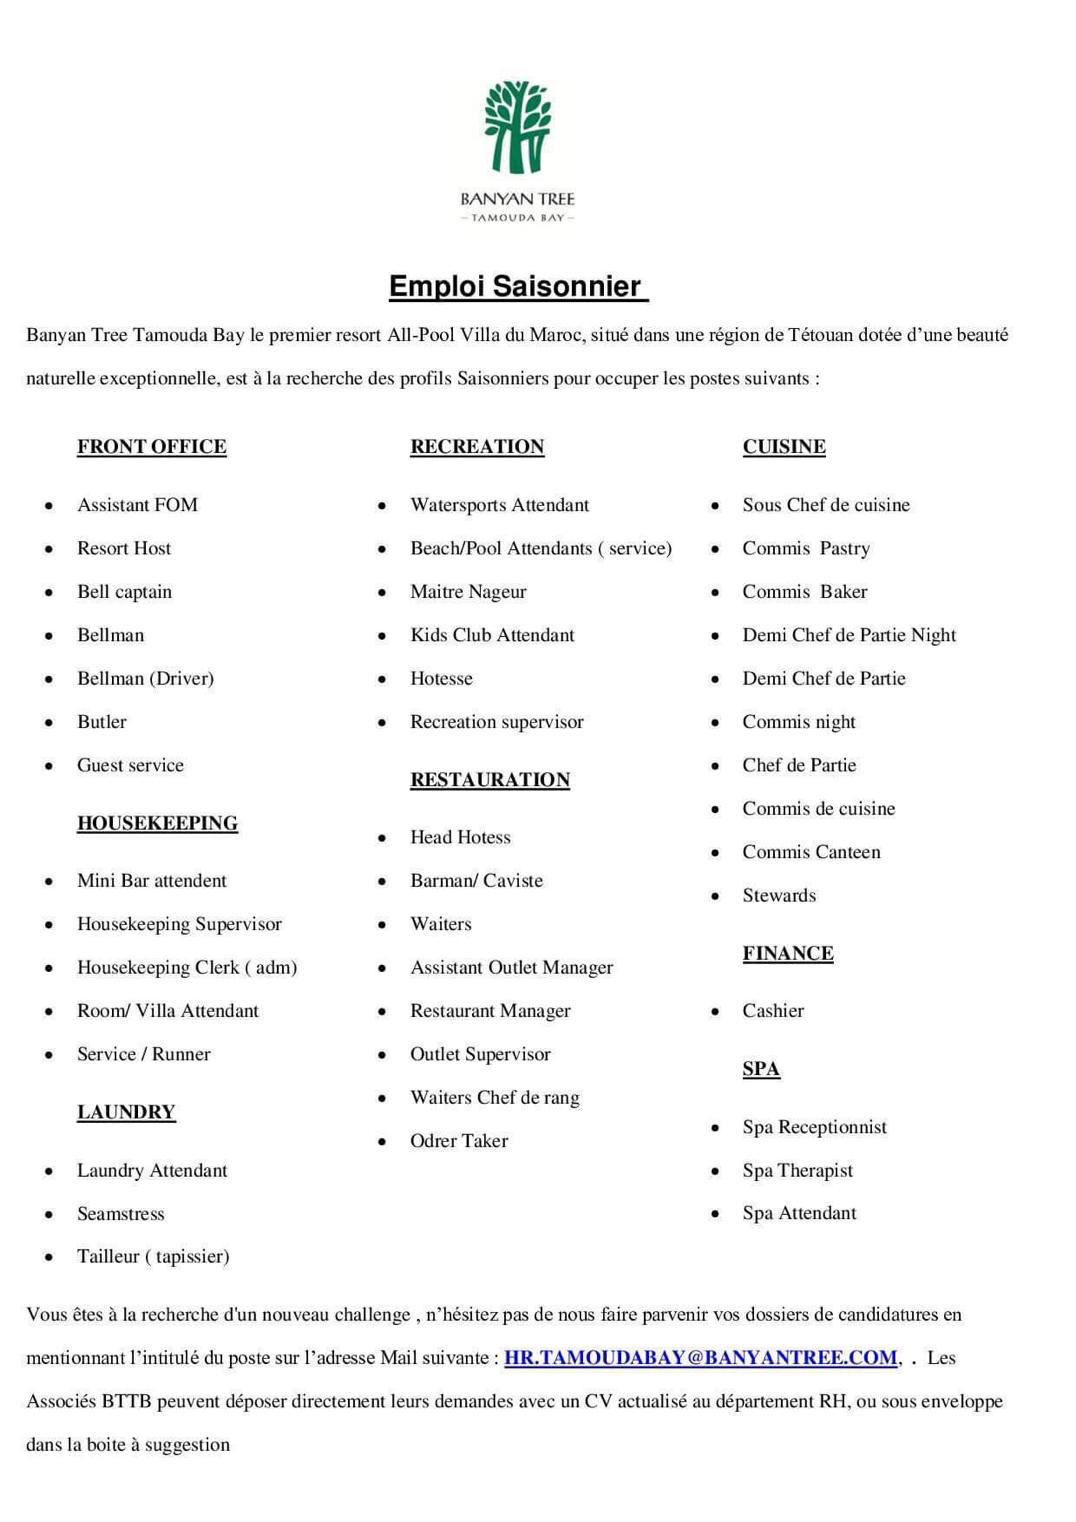 campagne de recrutement banyan tree  43 profils